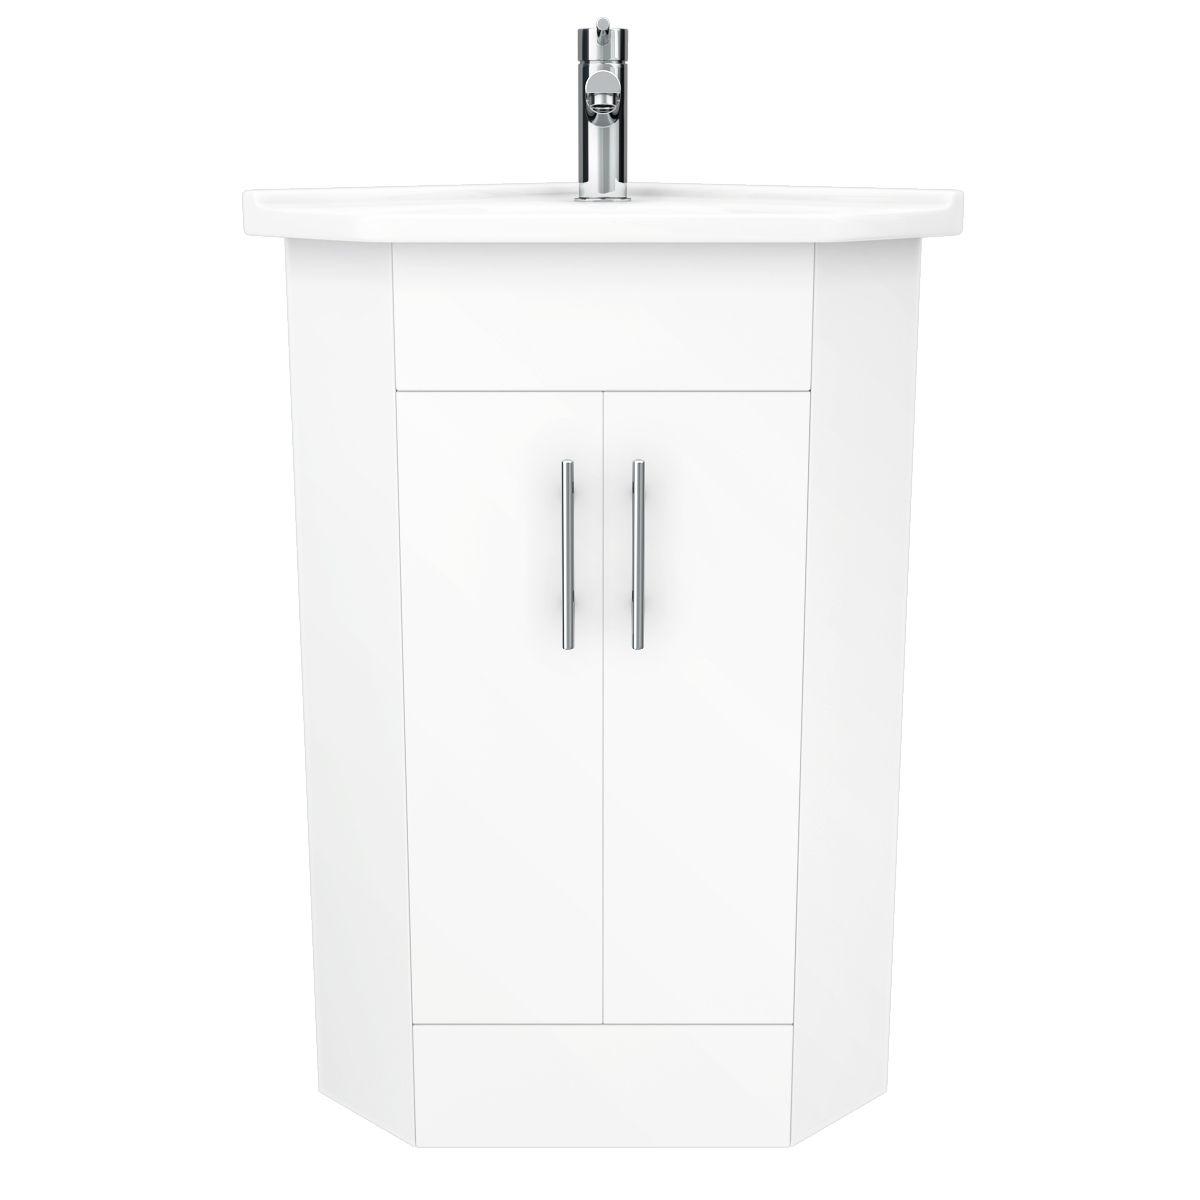 Alaska Corner Cabinet Vanity Unit (High Gloss White) | White corner ...